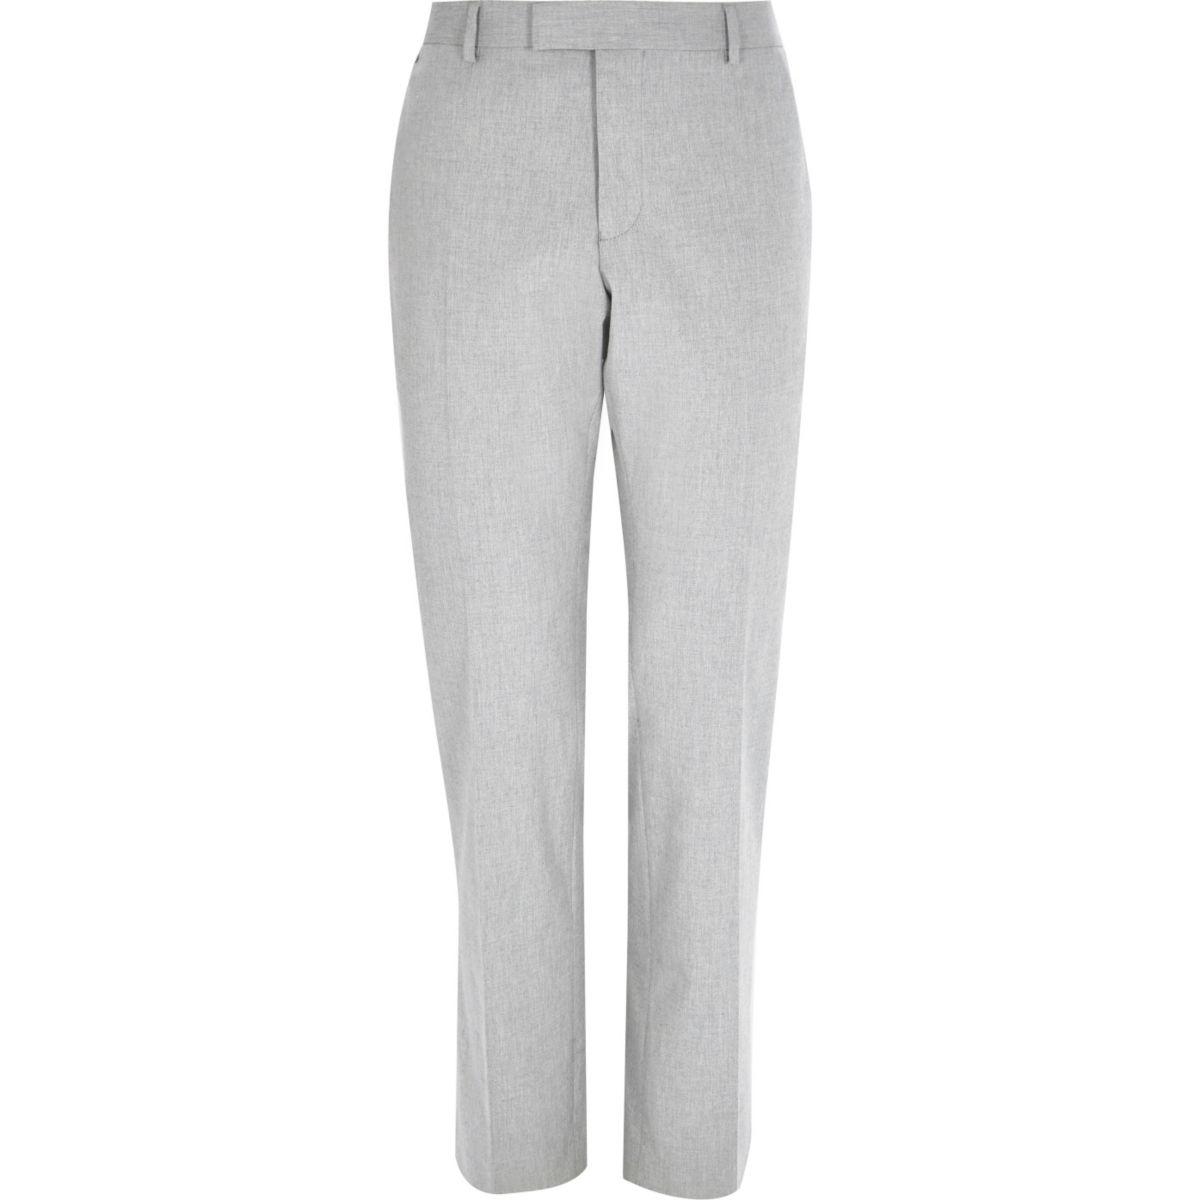 Light grey slim trousers